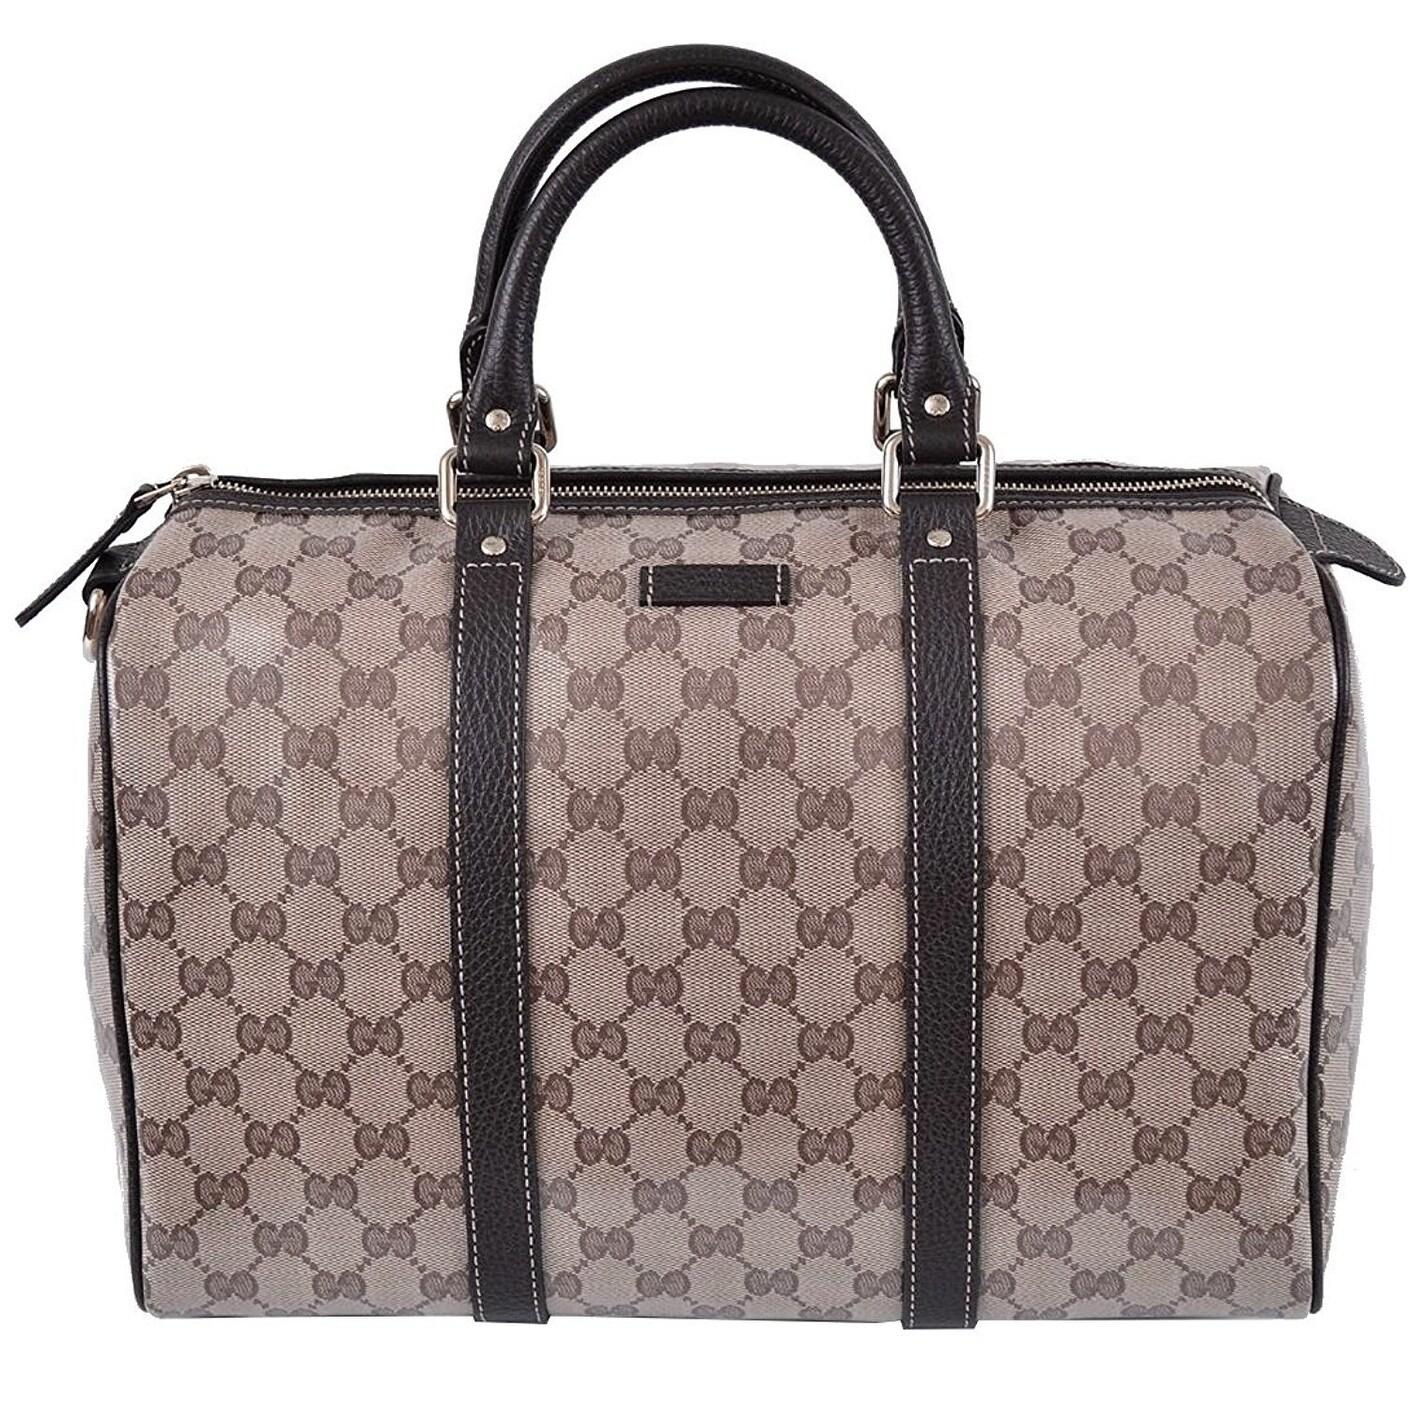 8866fb439 Shop Gucci Brown Crystal GG Canvas & Leather Boston Bag - Free ...